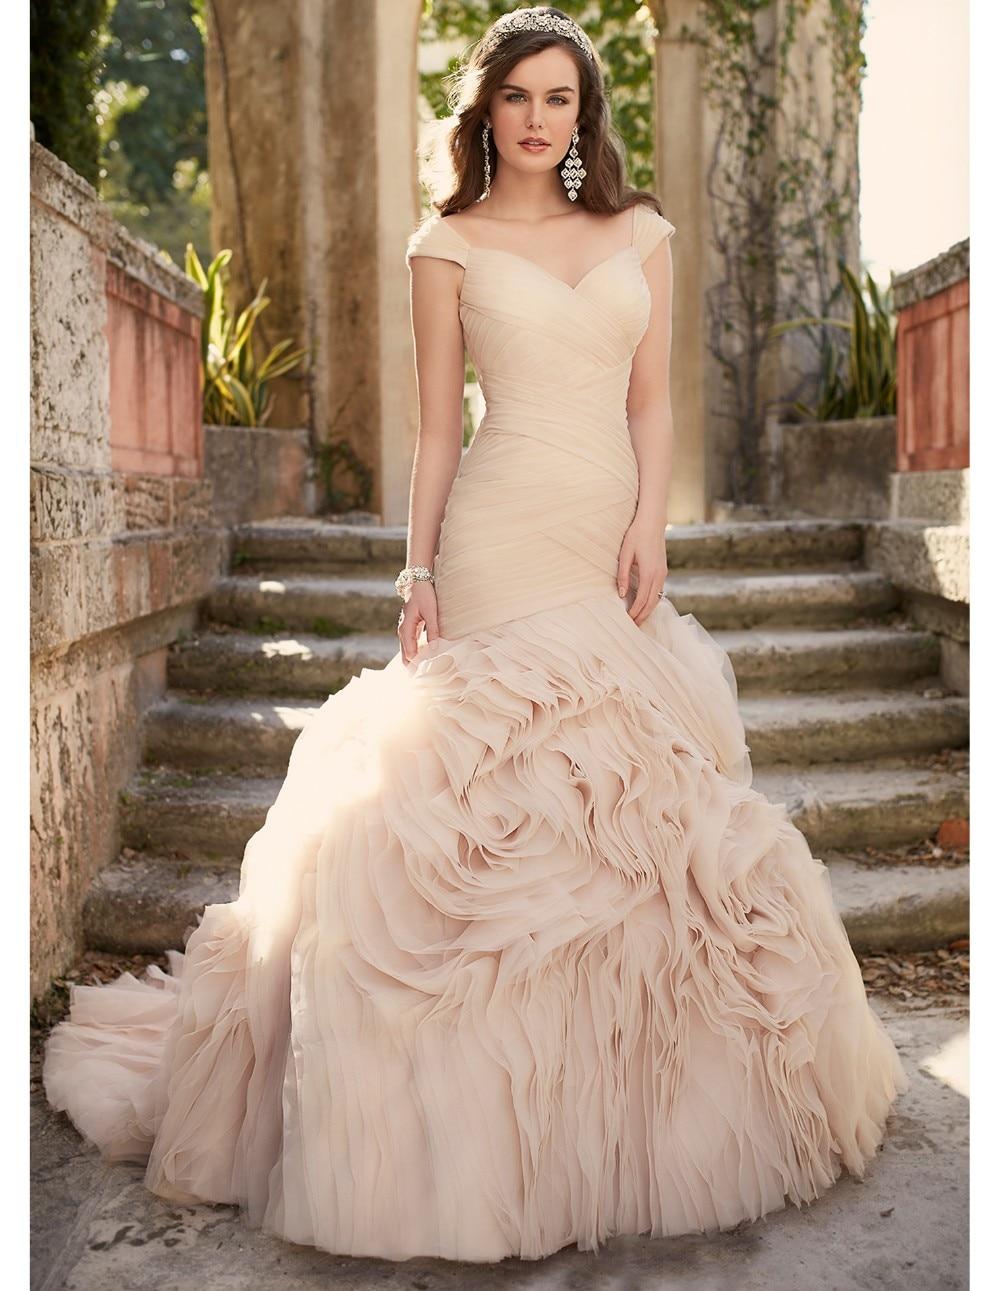 Mermaid pink wedding dresses exclusive photo